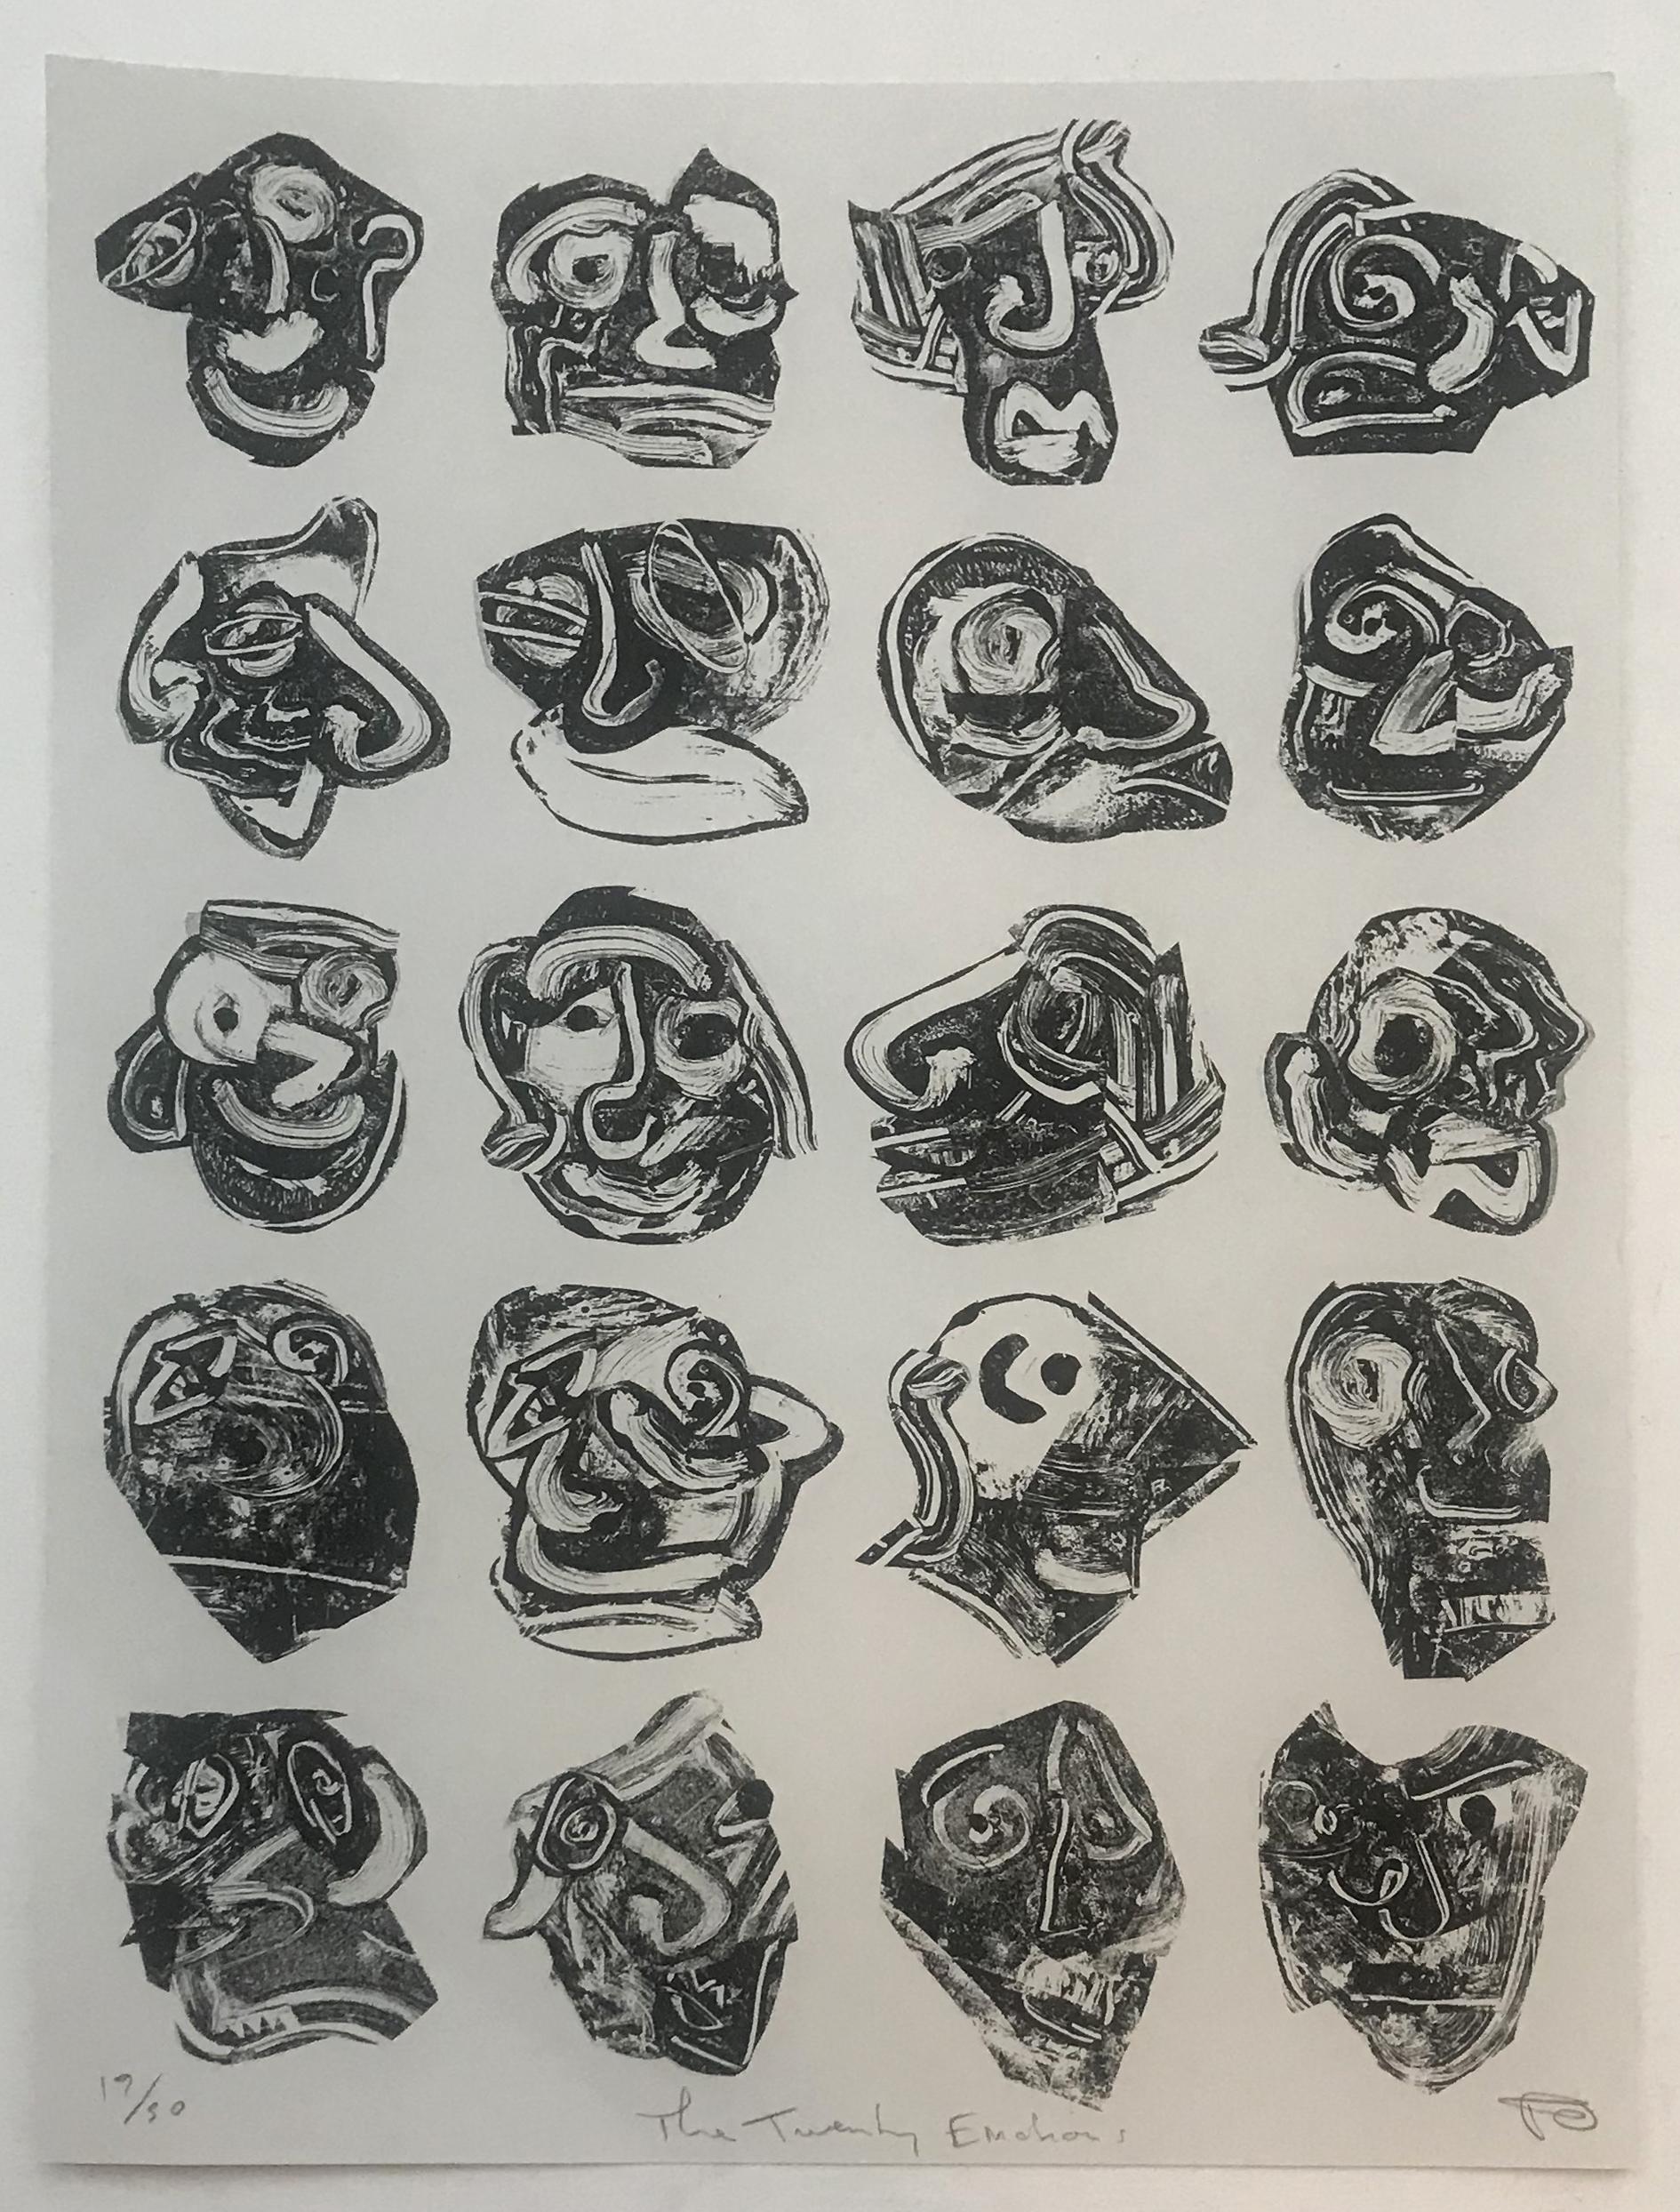 The Twenty Emotions